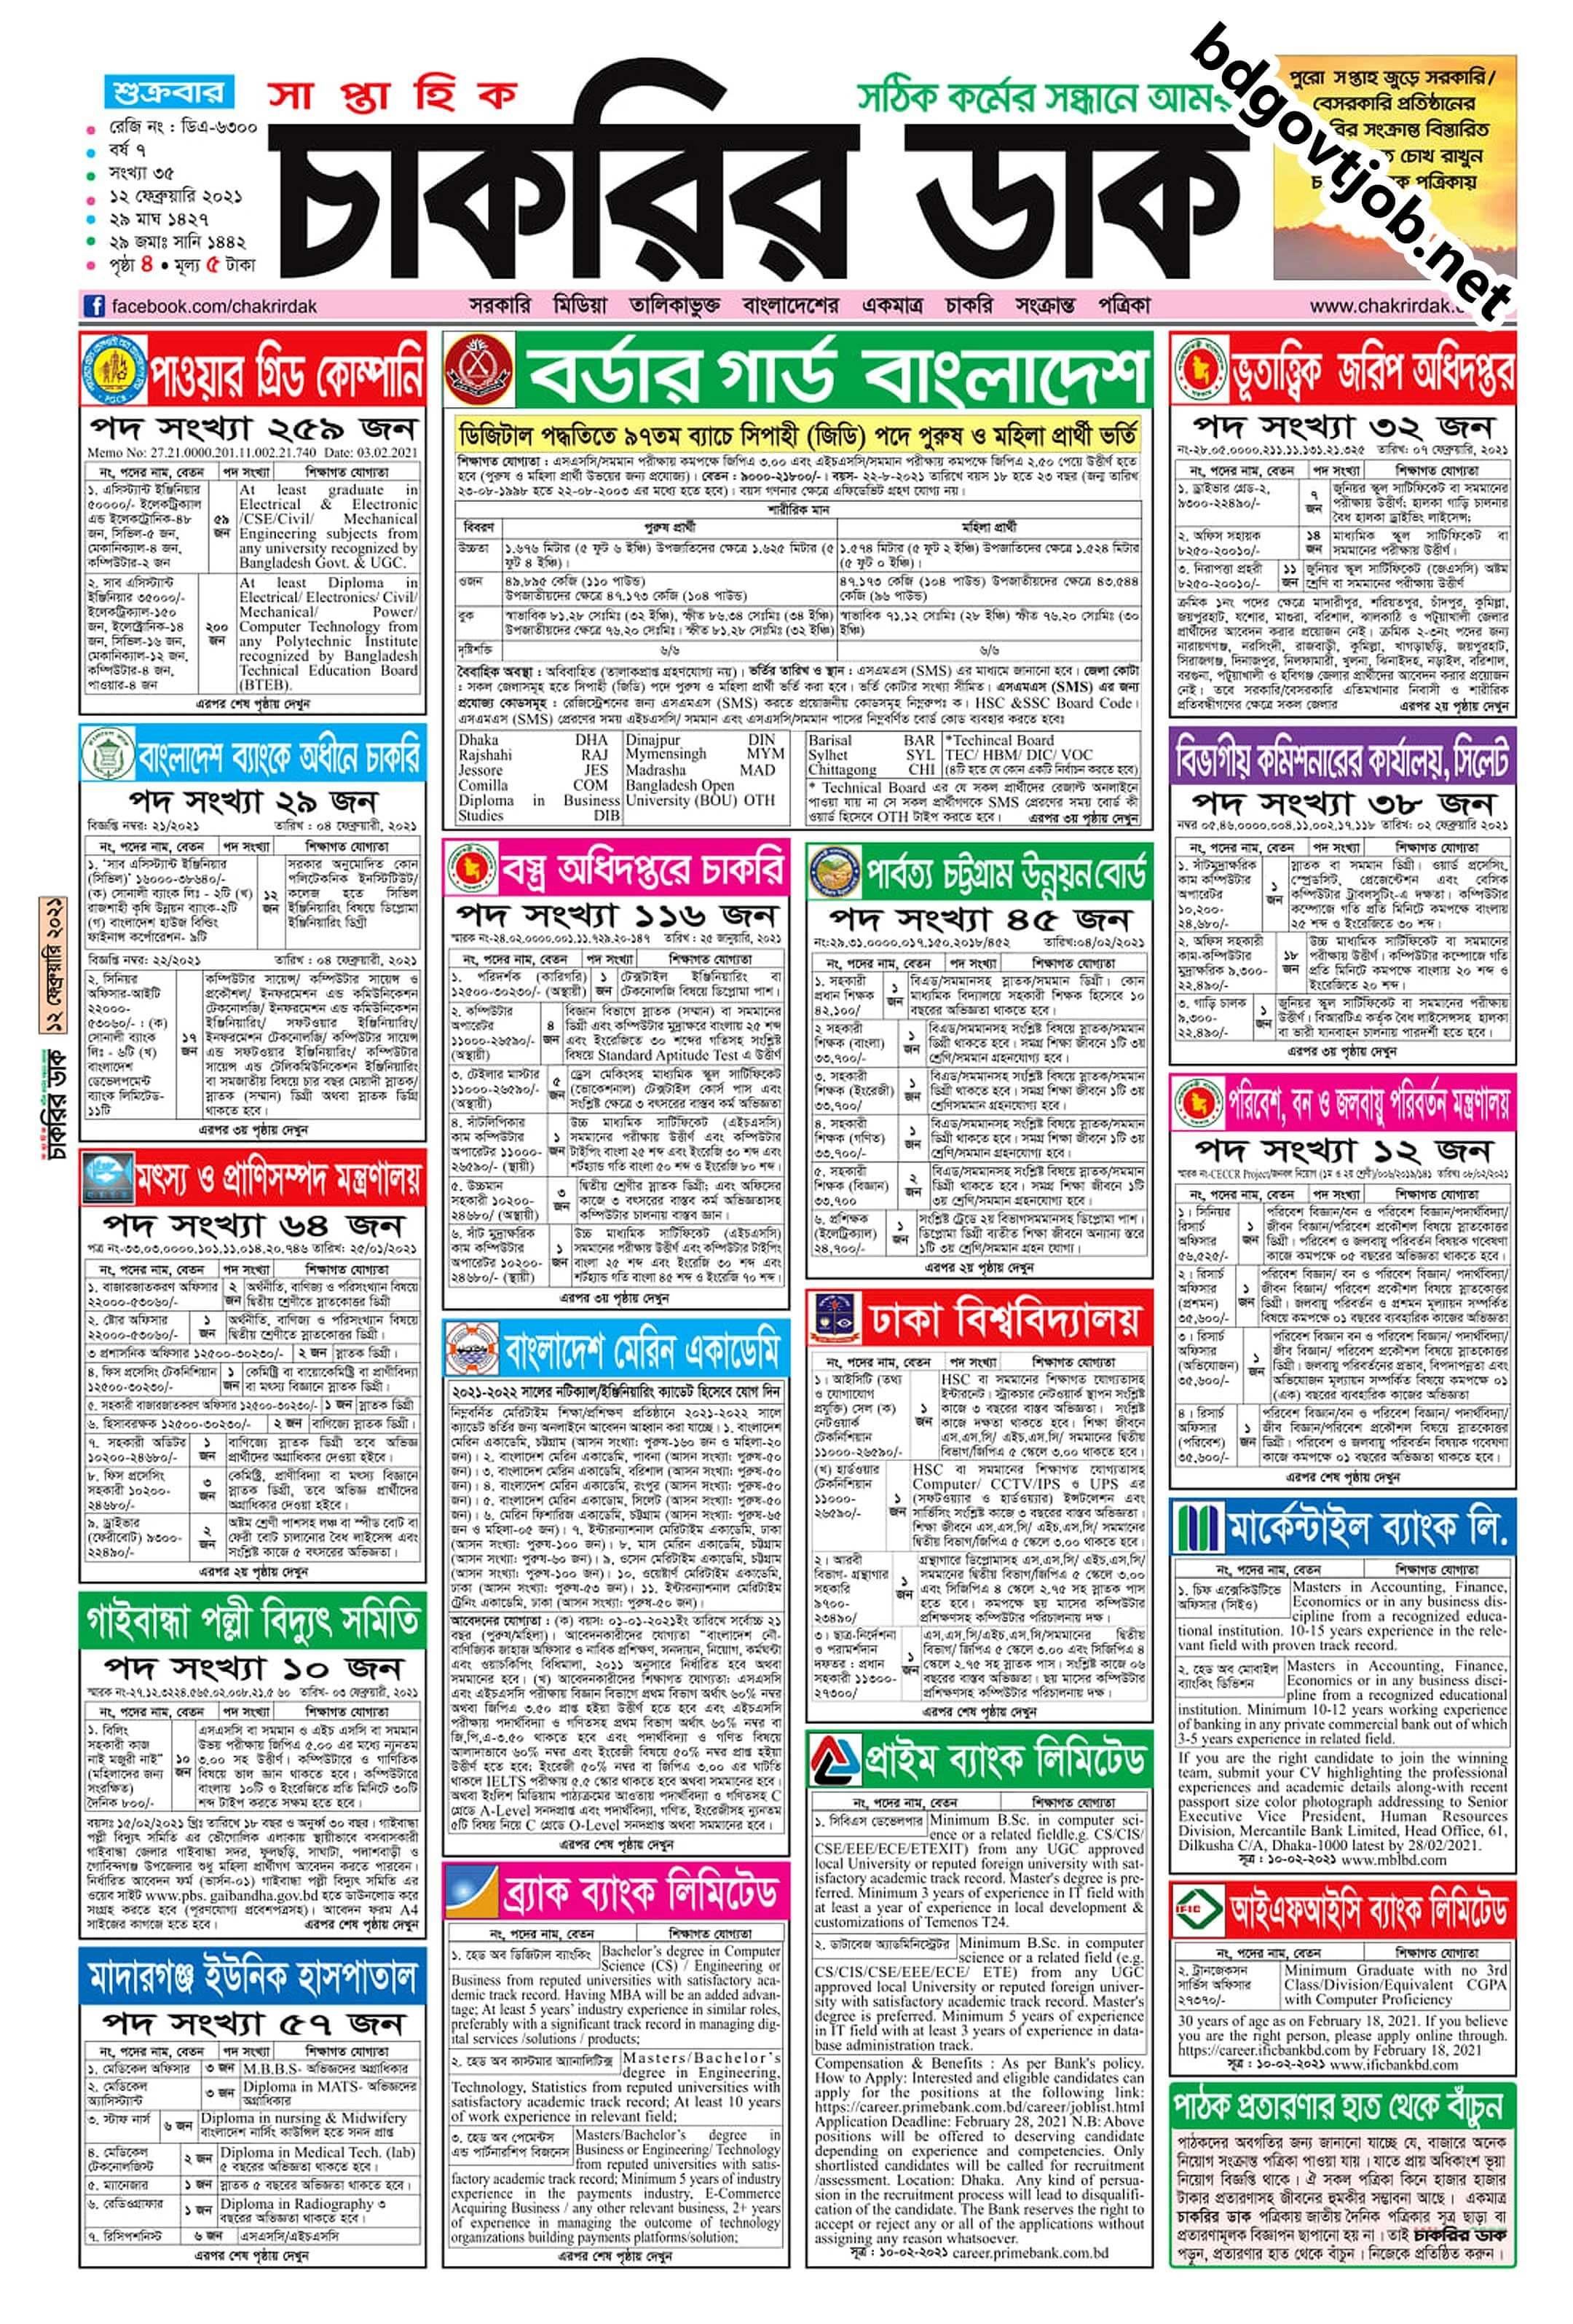 Saptahik Chakrir Khobor 12 February 2021 with PDF download